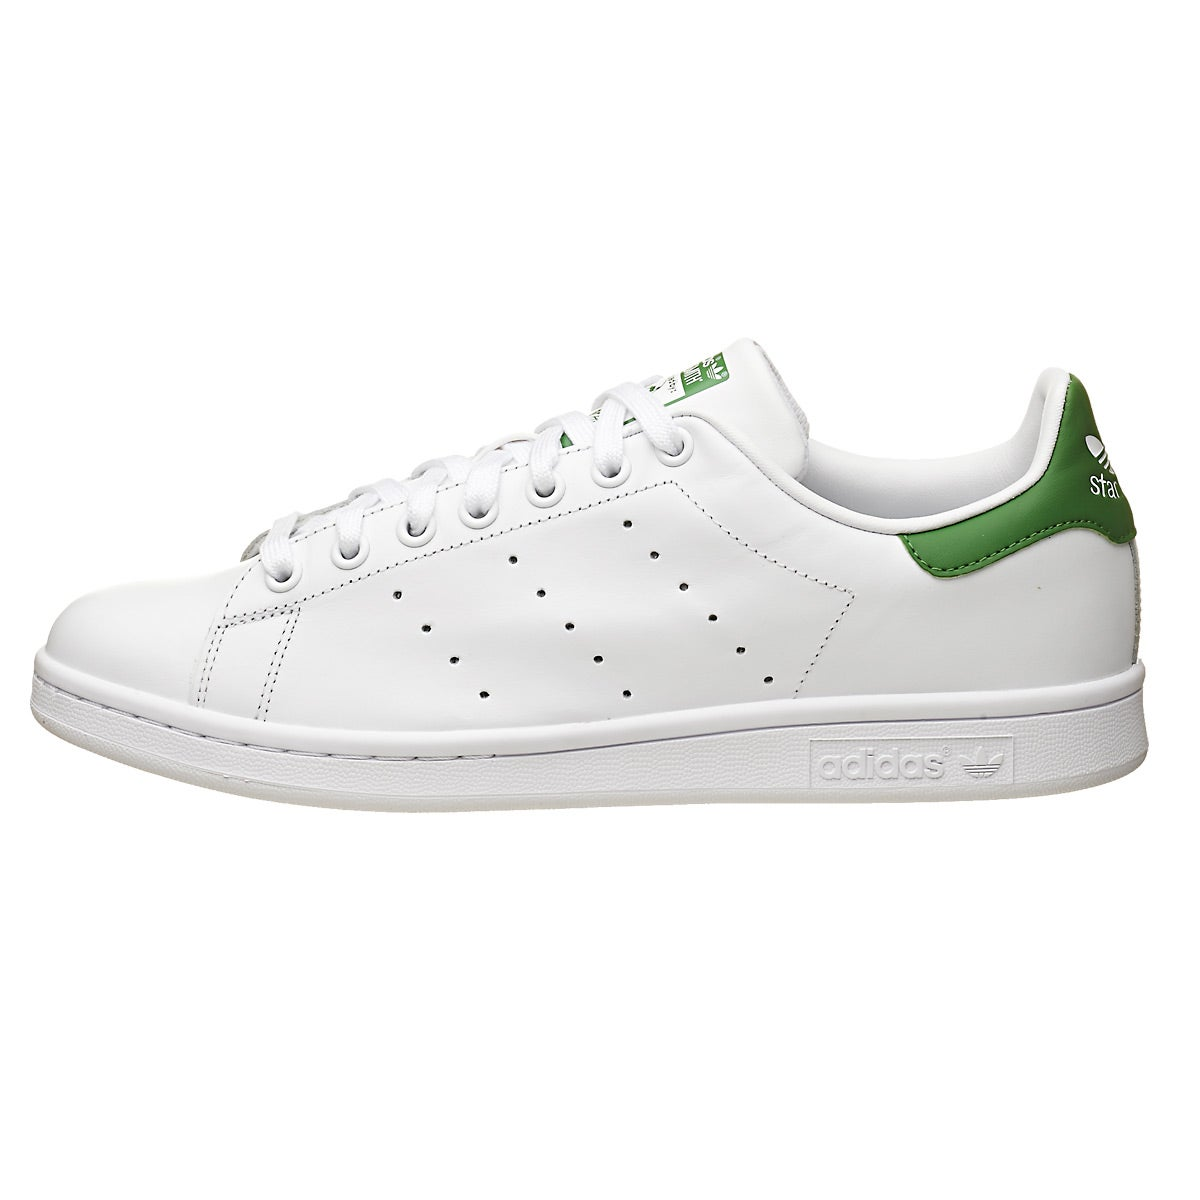 adidas Originals Stan Smith White/Green Men\u0027s Shoe 360� View.